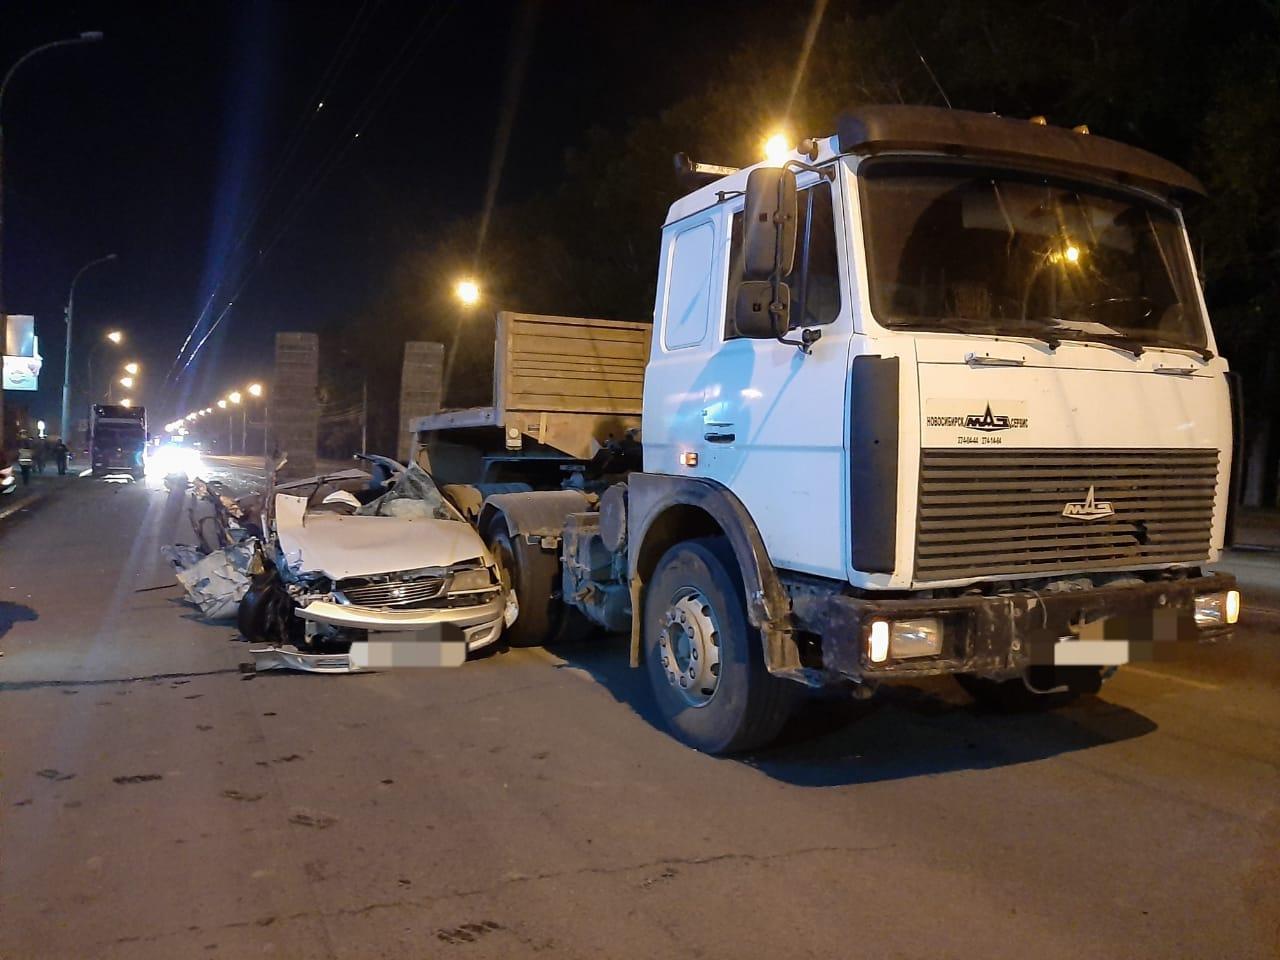 Фото 33-летний водитель Toyota погиб в ДТП с грузовиками Volvo и МАЗ в Новосибирске 2